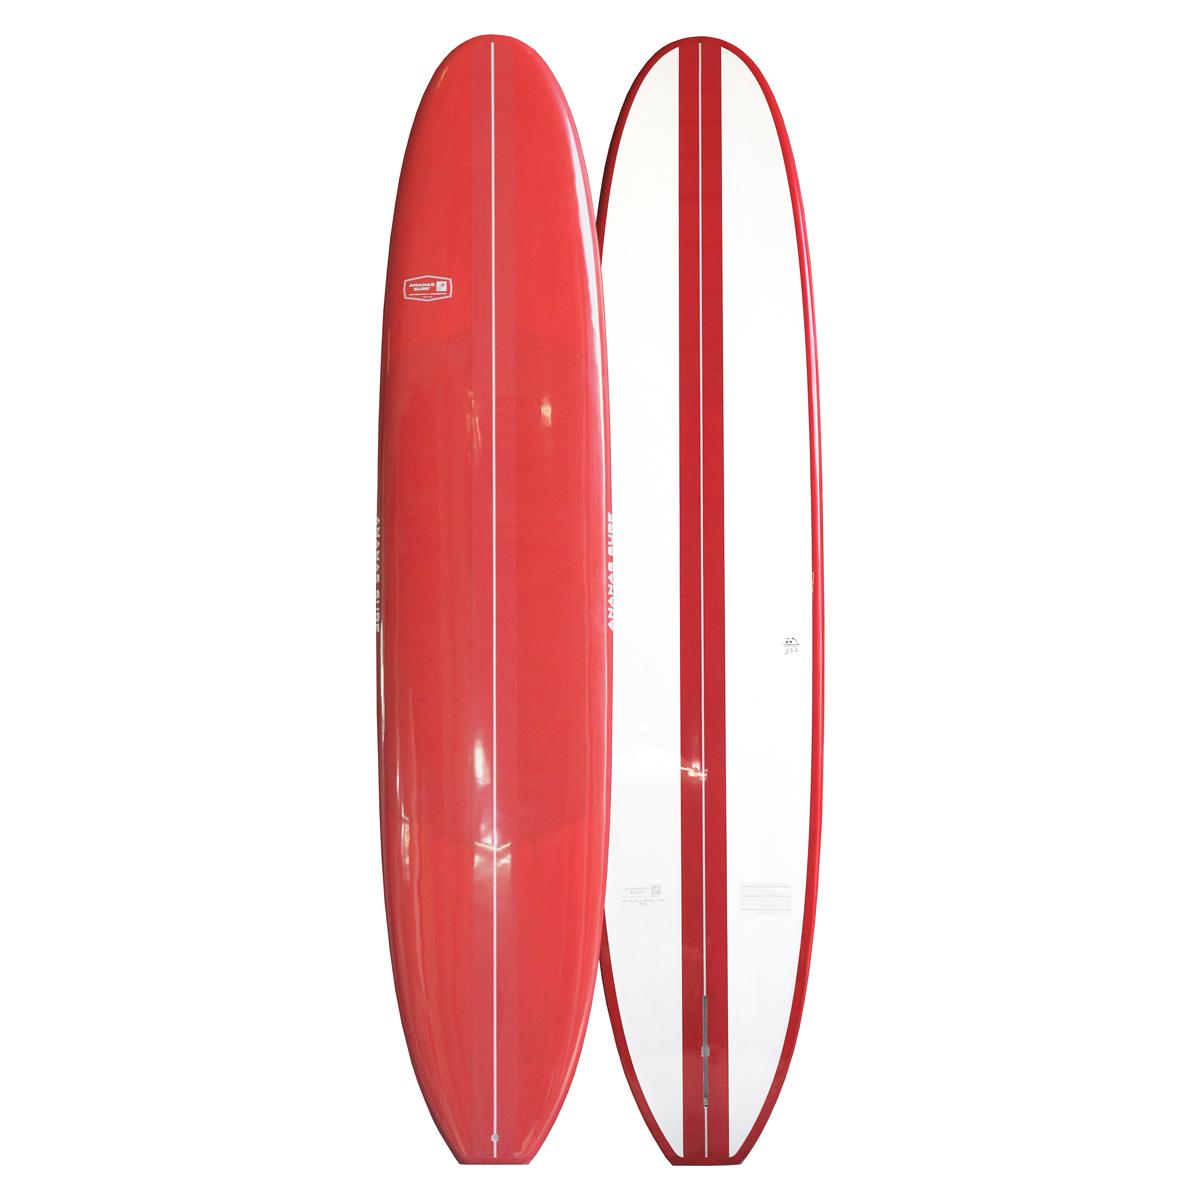 "Ananas Surf Noserider longboard 9'1"" old school"